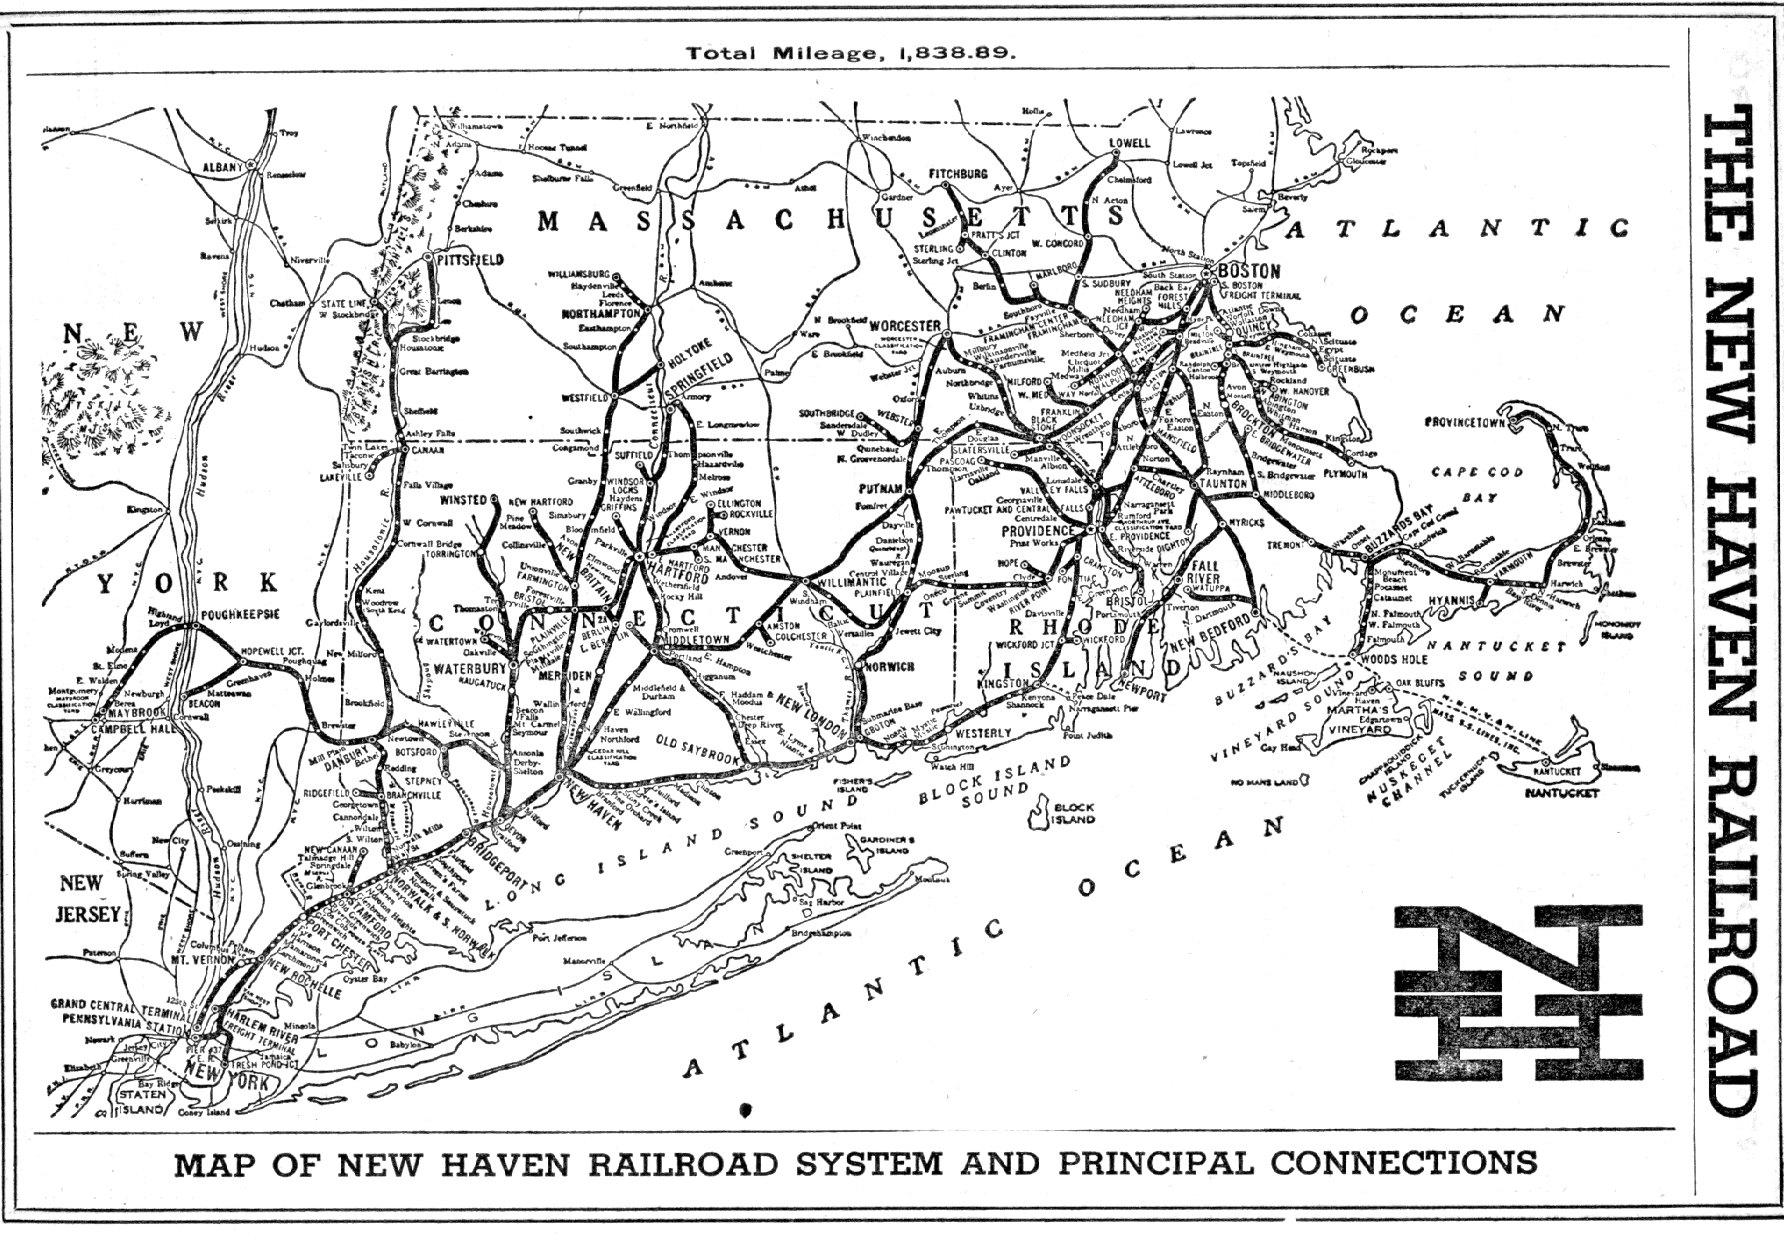 Railroad View Topic